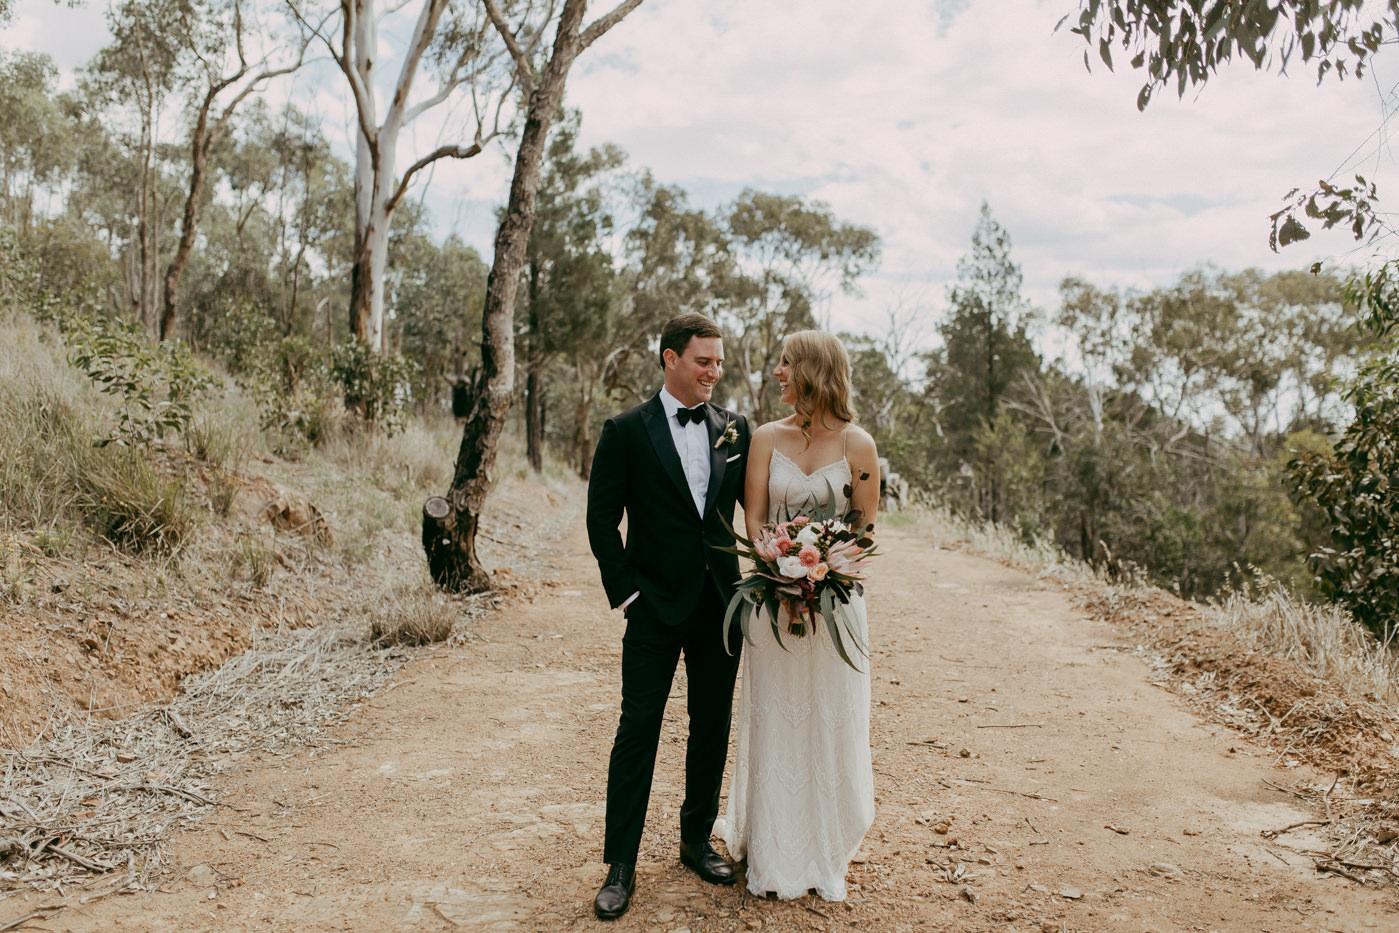 Anthony & Eliet - Wagga Wagga Wedding - Country NSW - Samantha Heather Photography-51.jpg